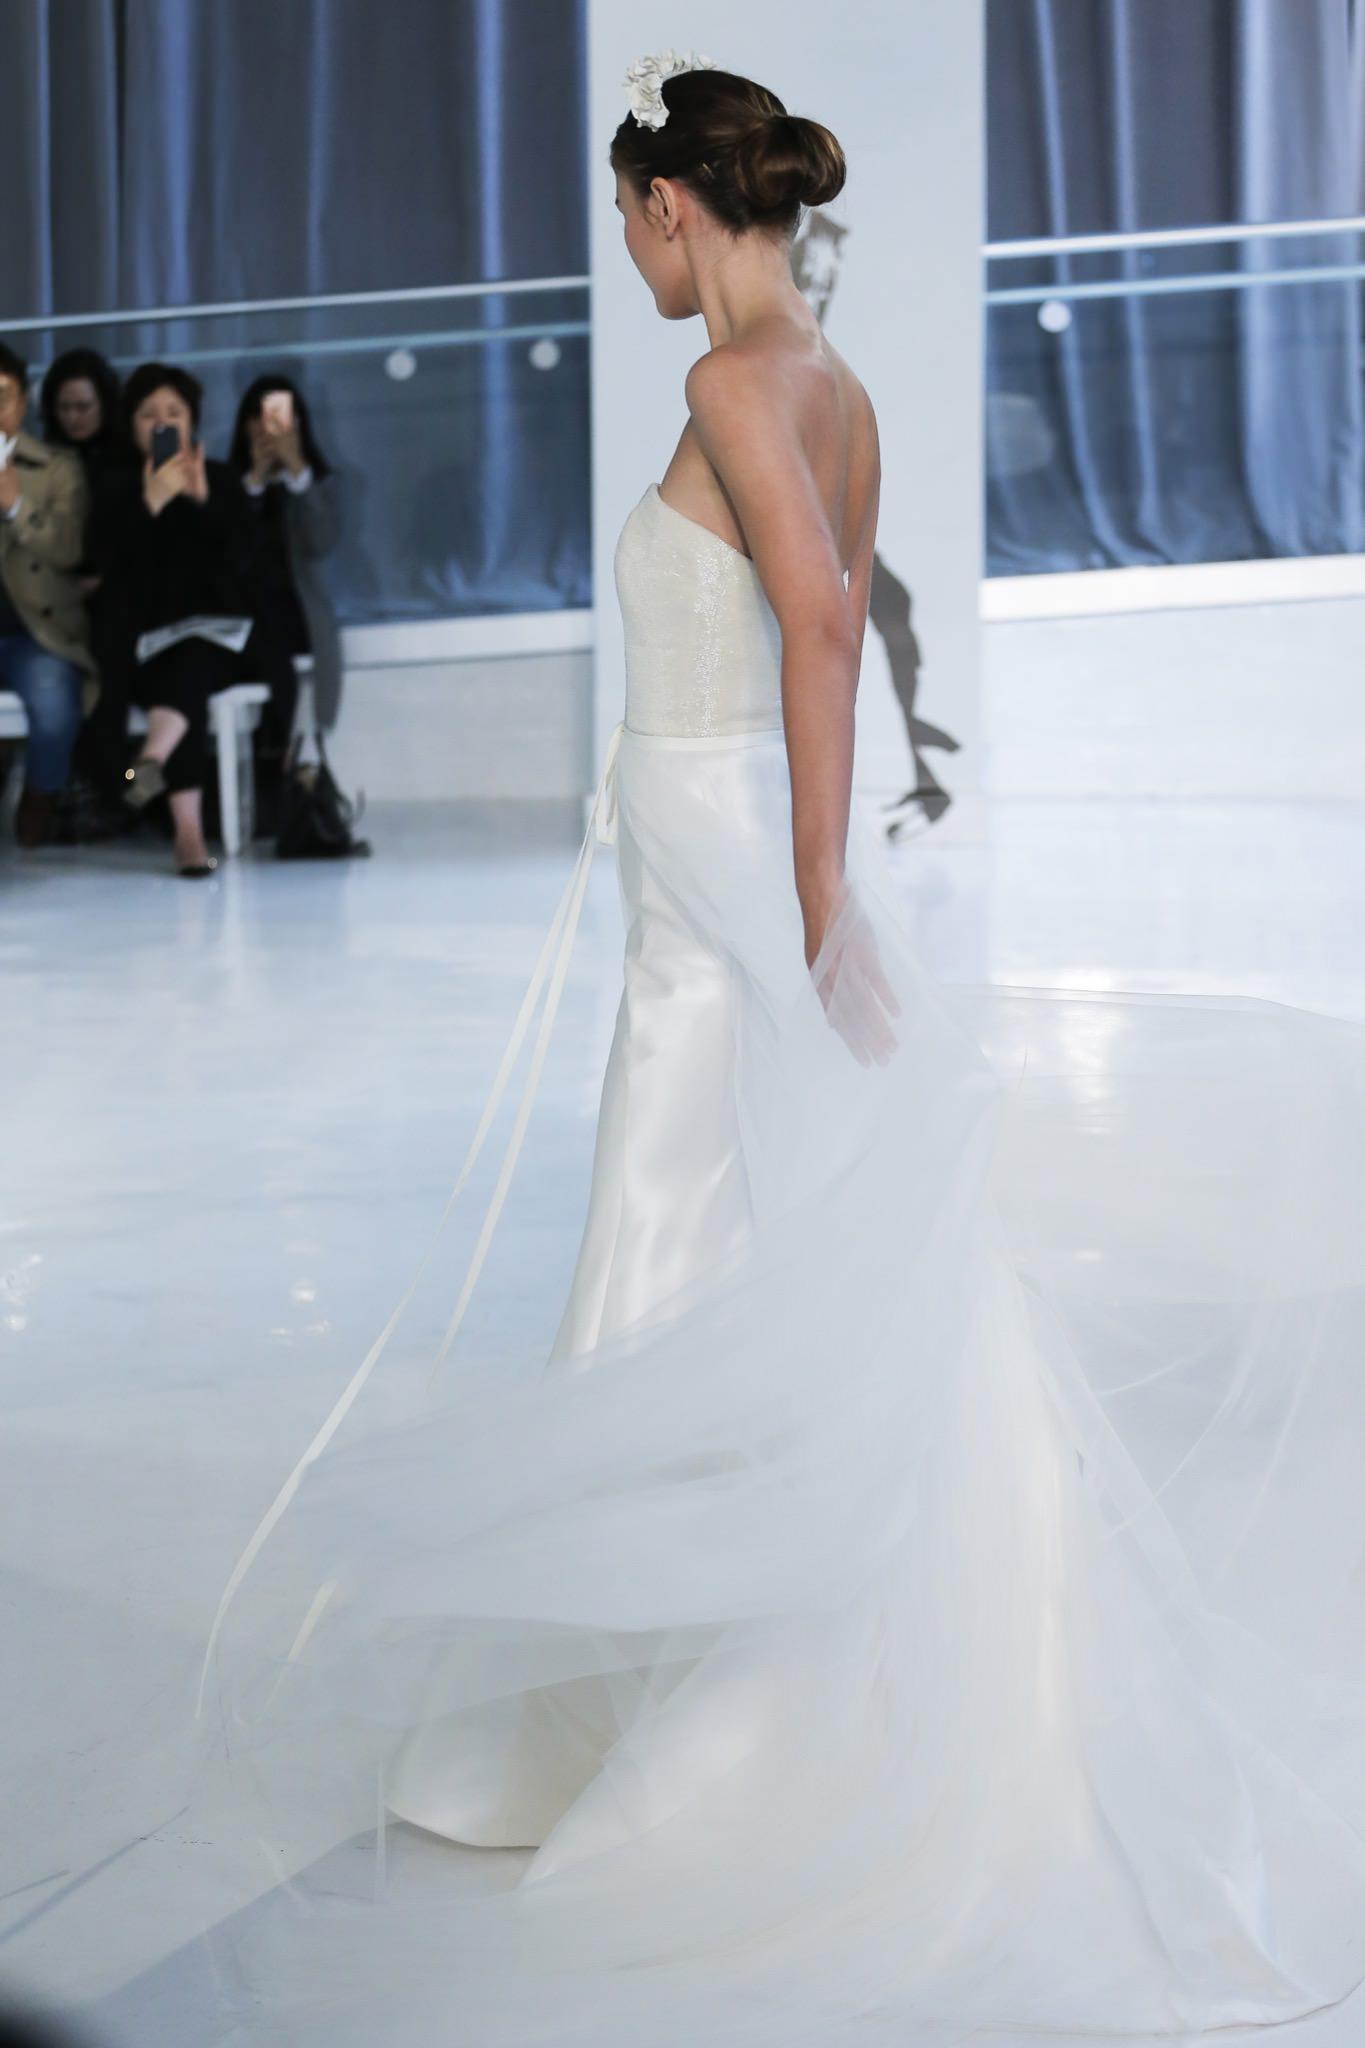 Enchanting Wedding Dresses Milwaukee Wi Ensign - All Wedding Dresses ...